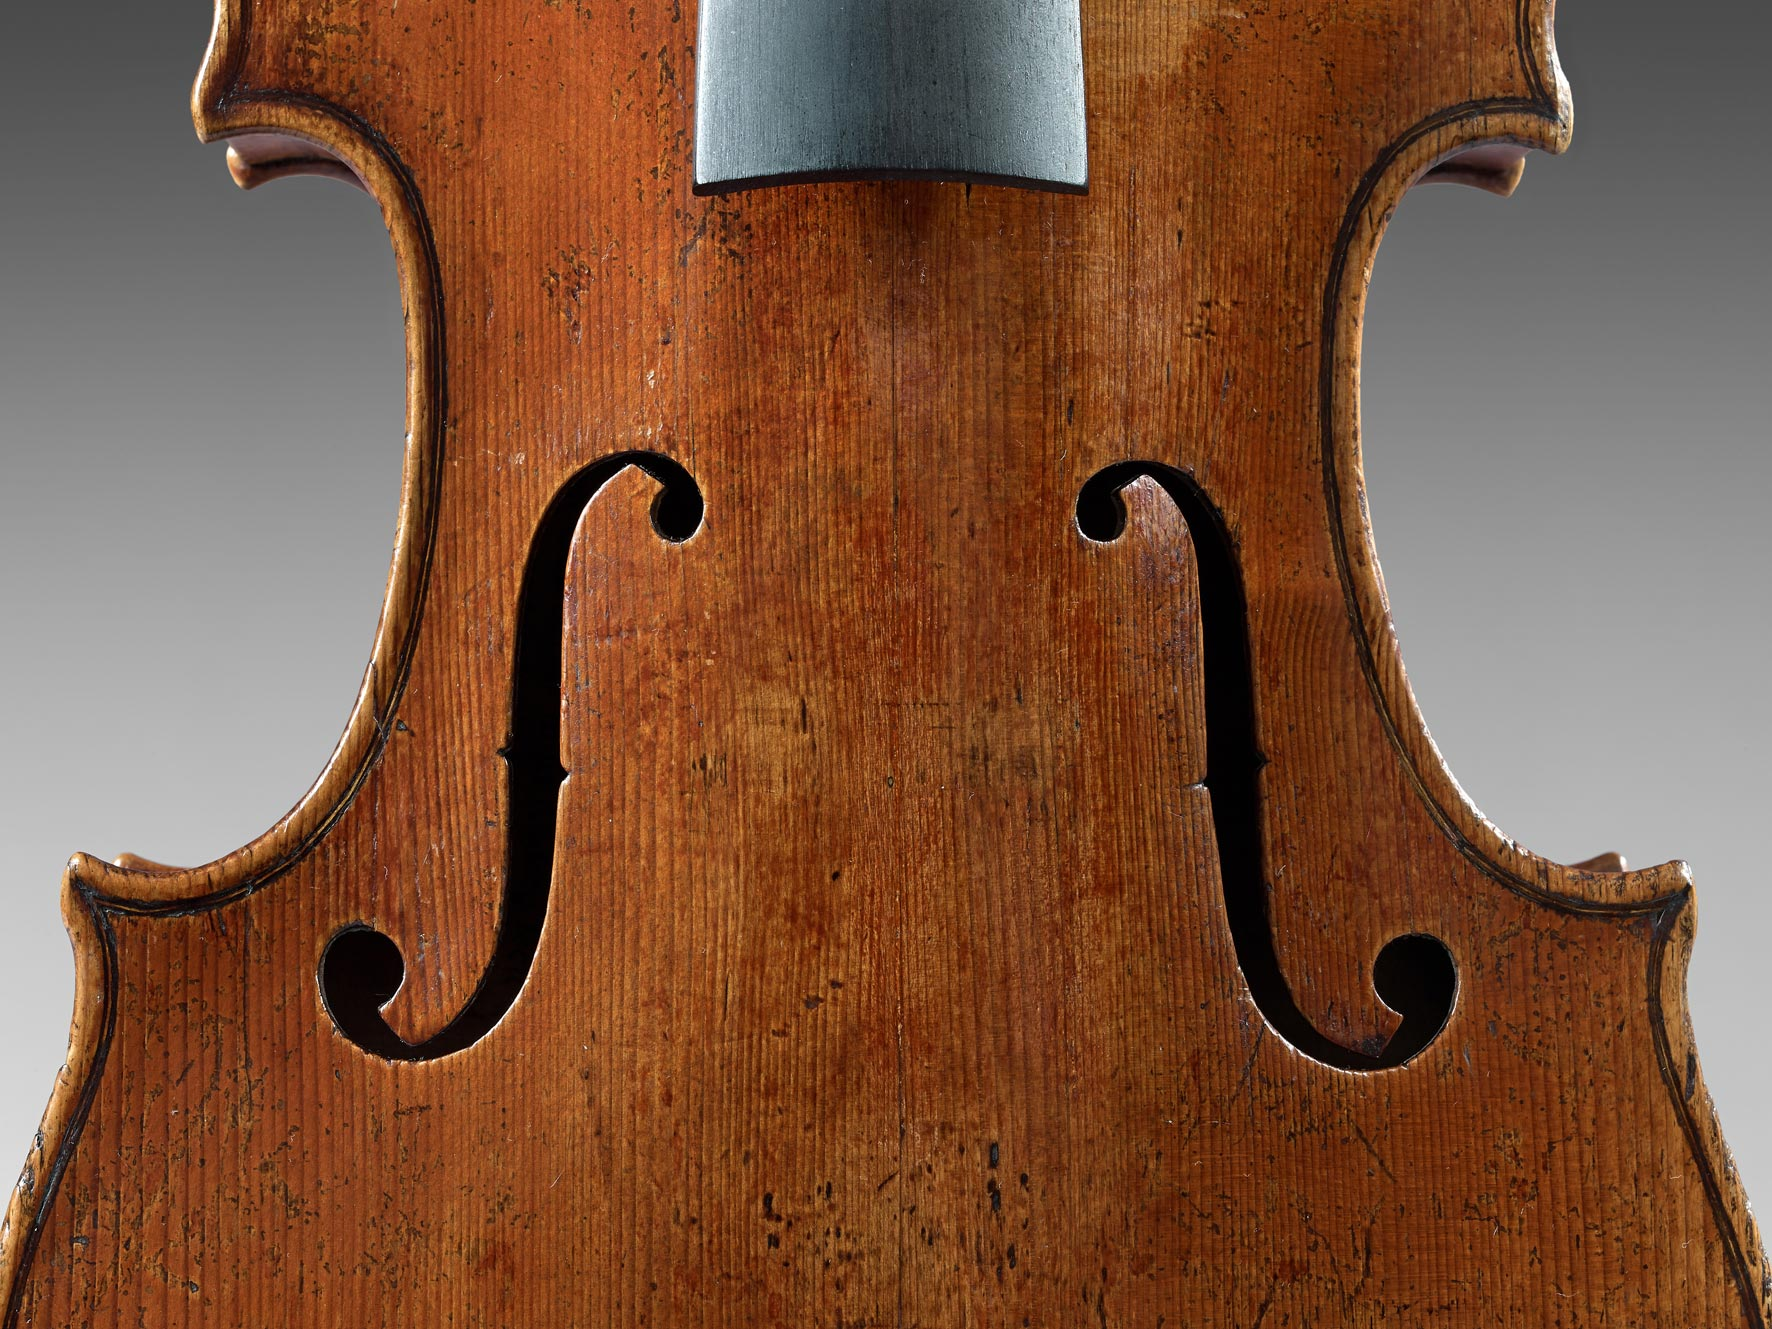 125-3-violon-joseph-guarnerius-c2a9sebert.jpg